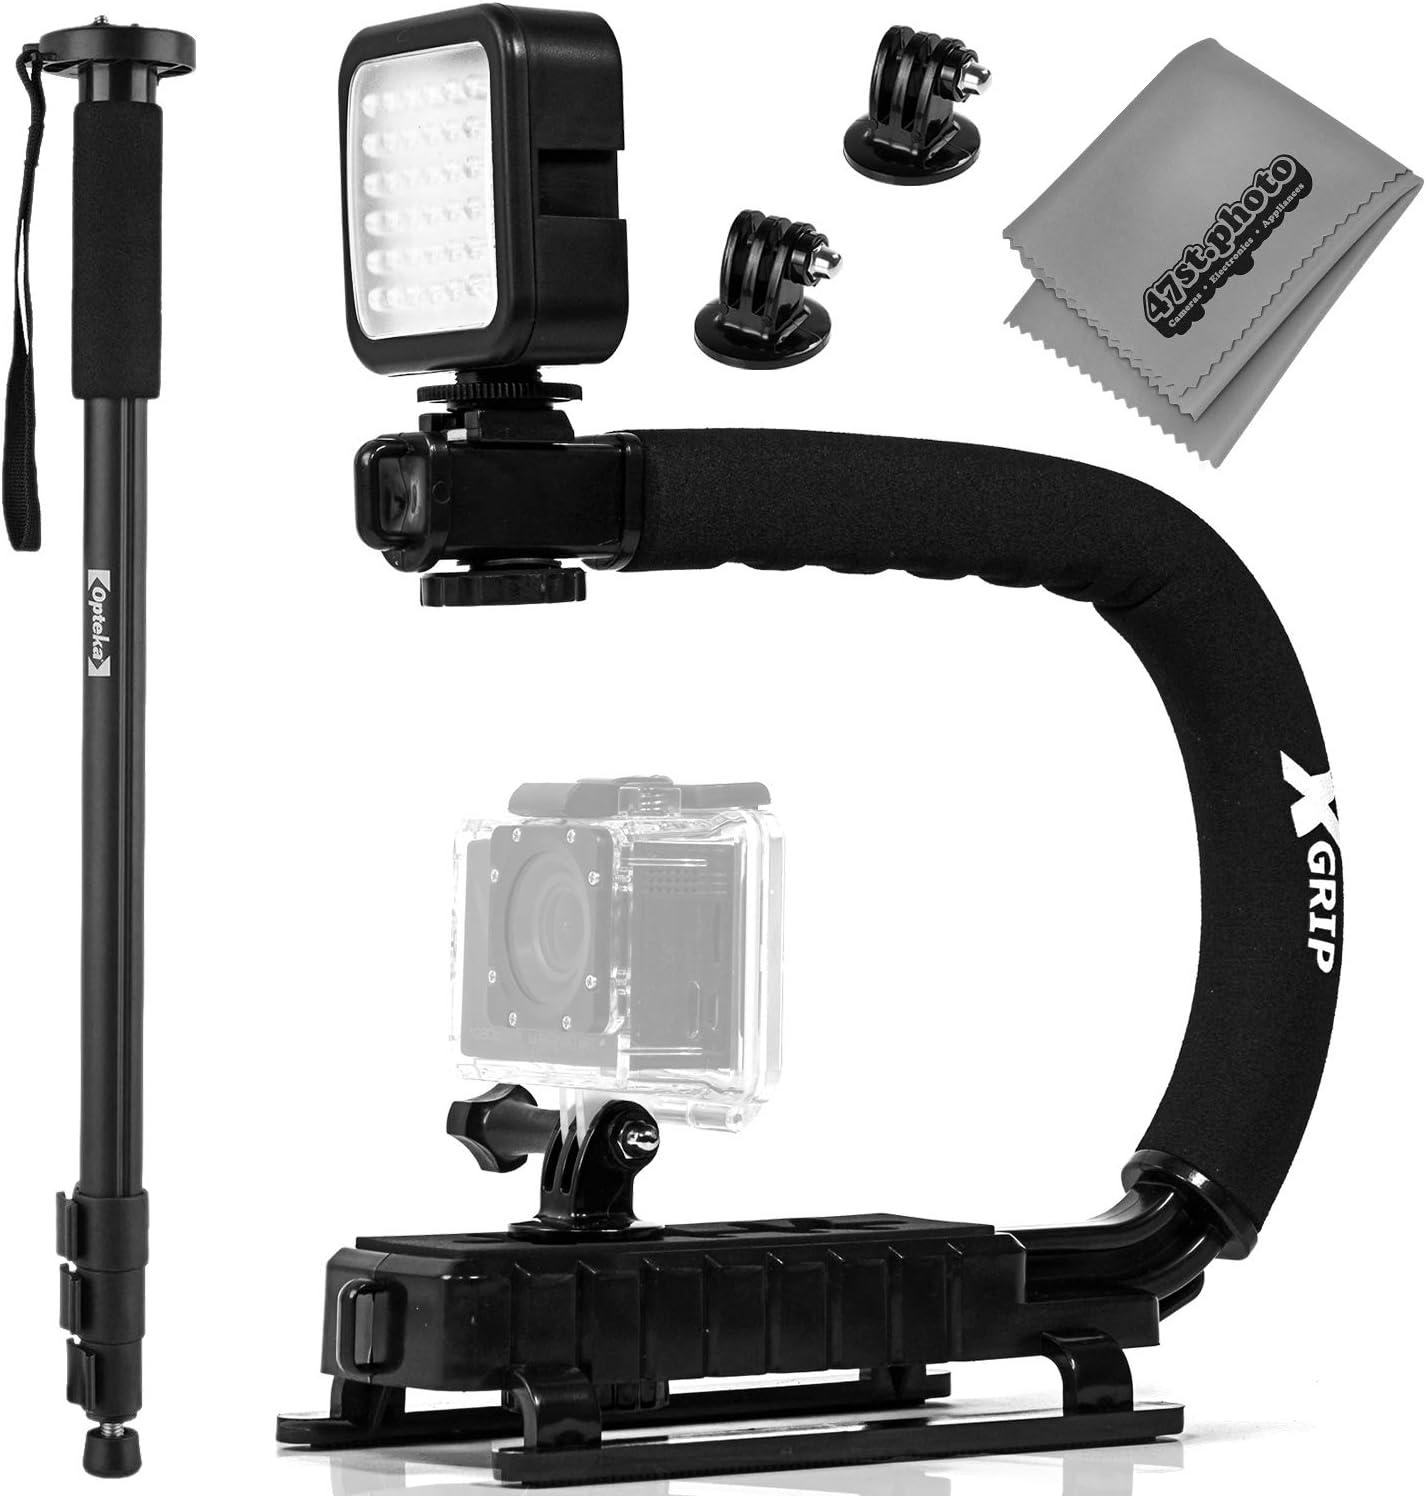 Pro Video Stabilizing Handle Grip for Sony Cyber-Shot DSC-T33 Vertical Shoe Mount Stabilizer Handle